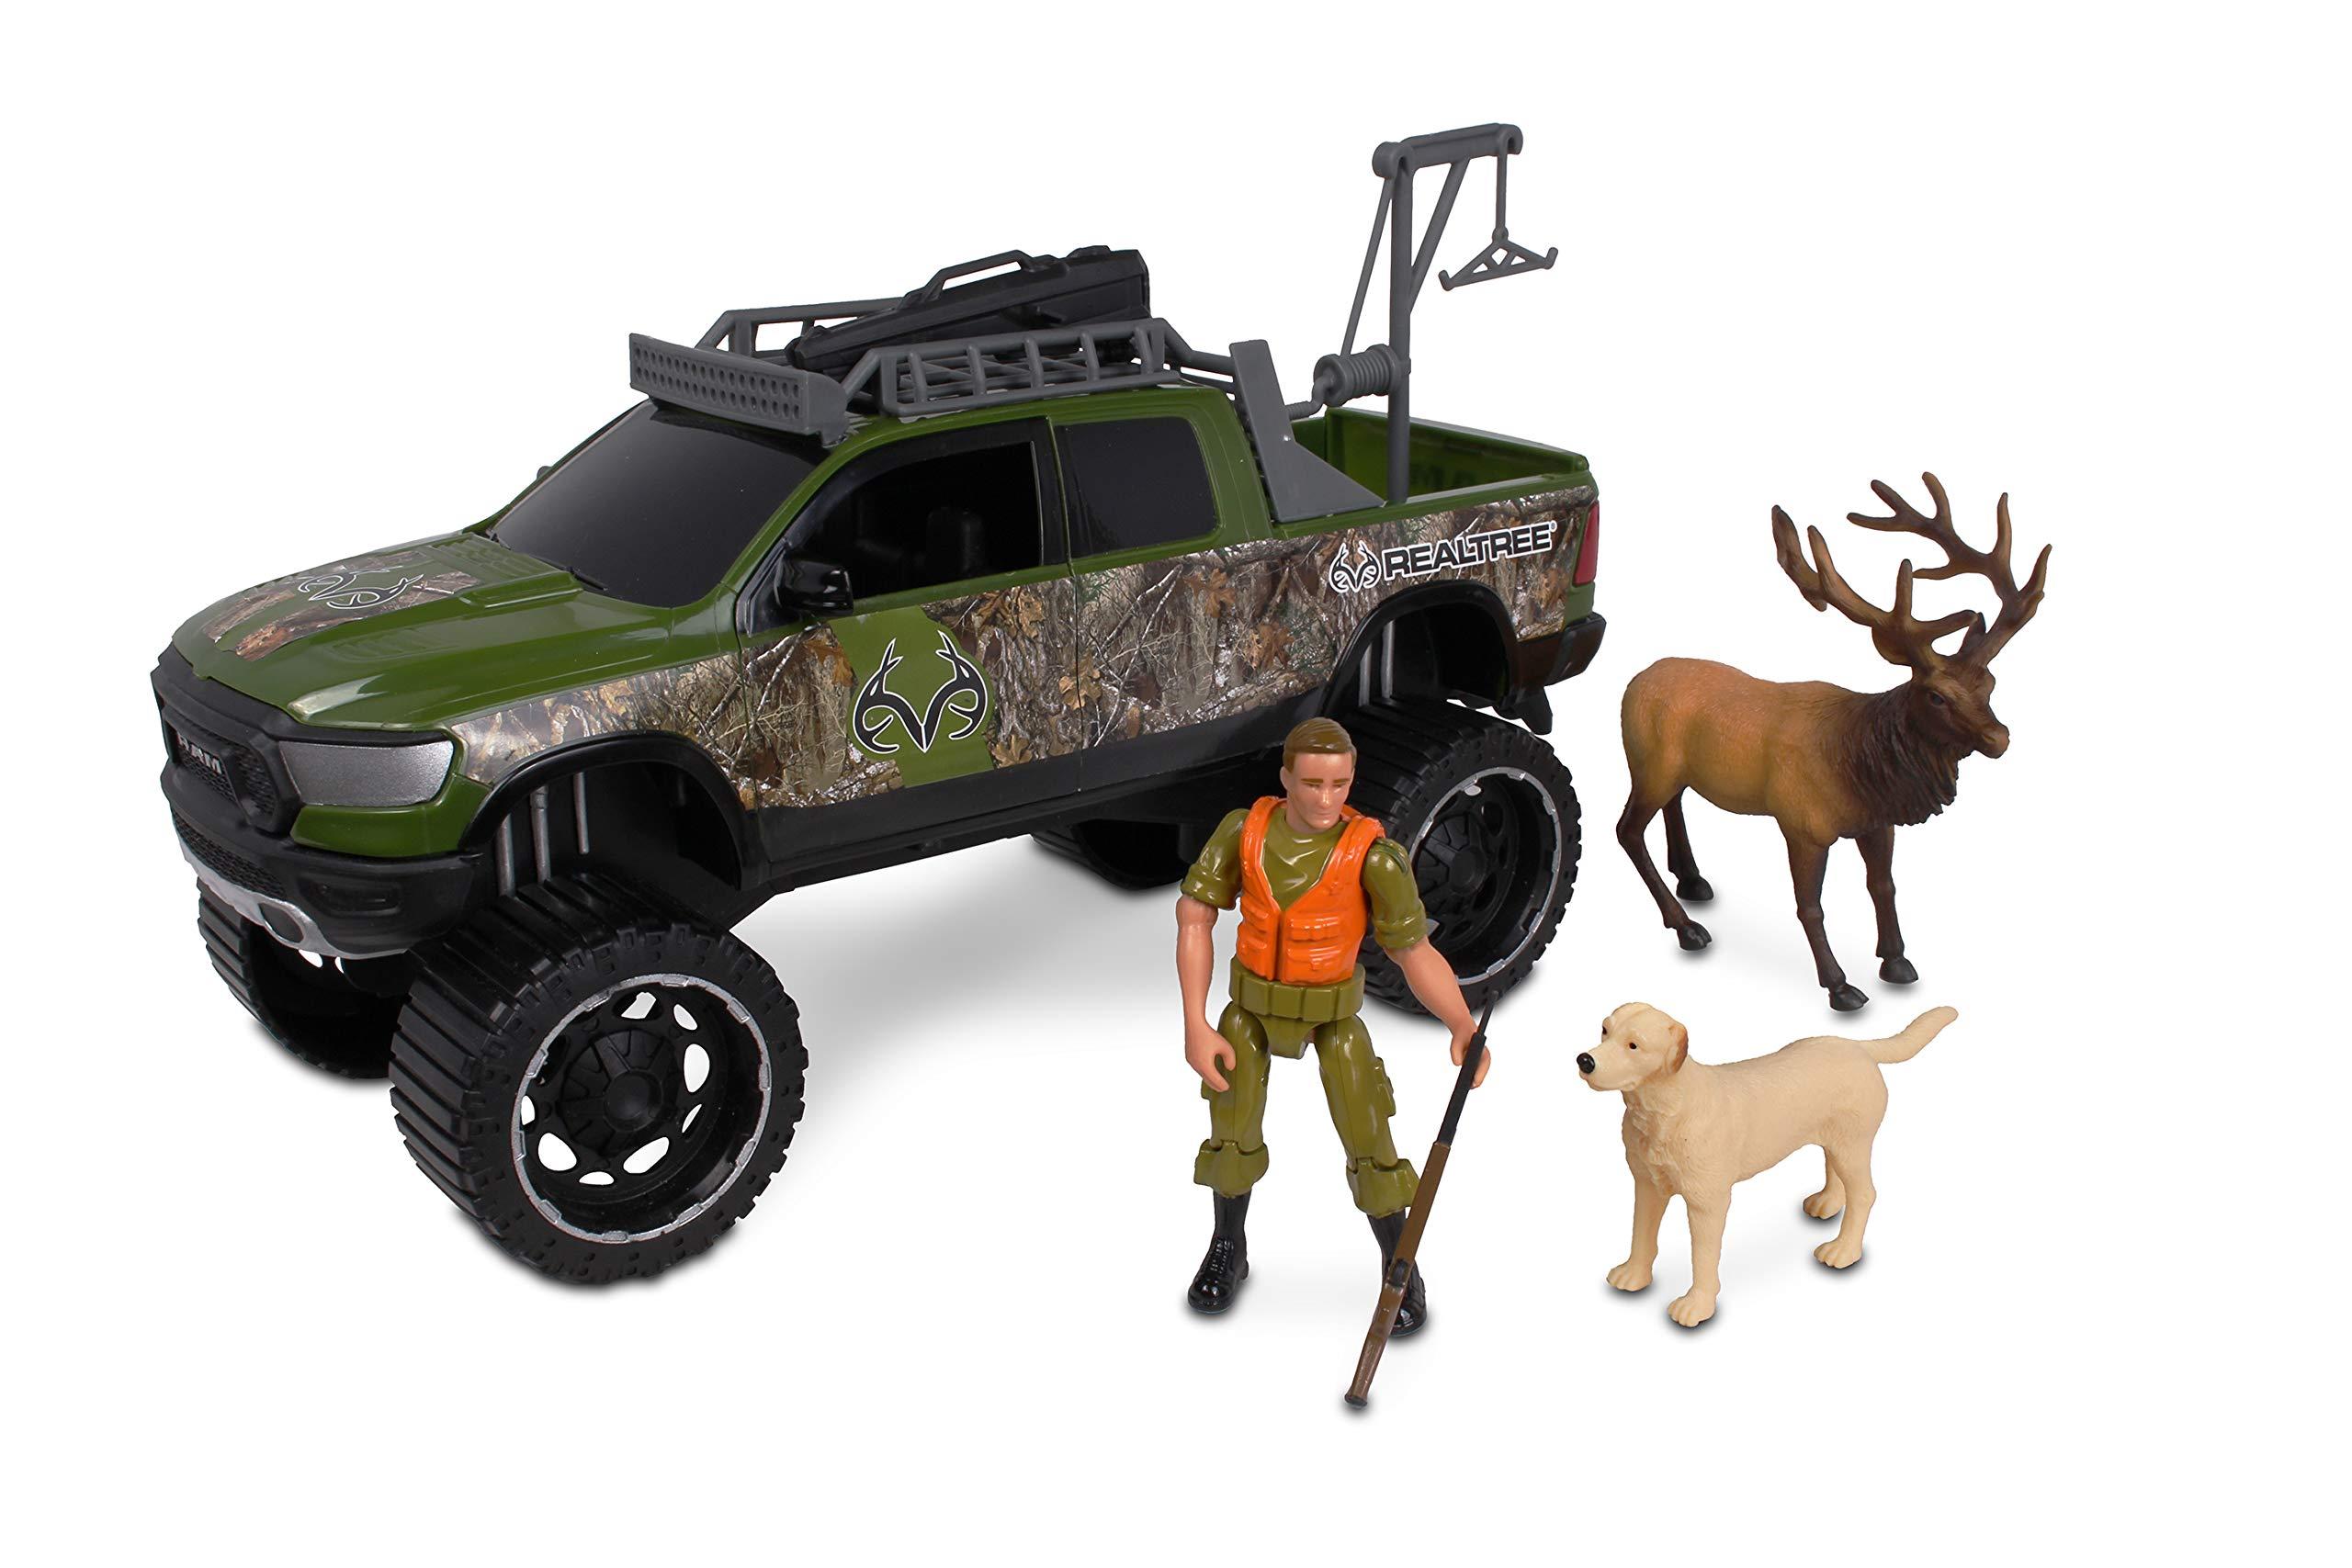 NKOK Realtree 8Piece Hunting Playset